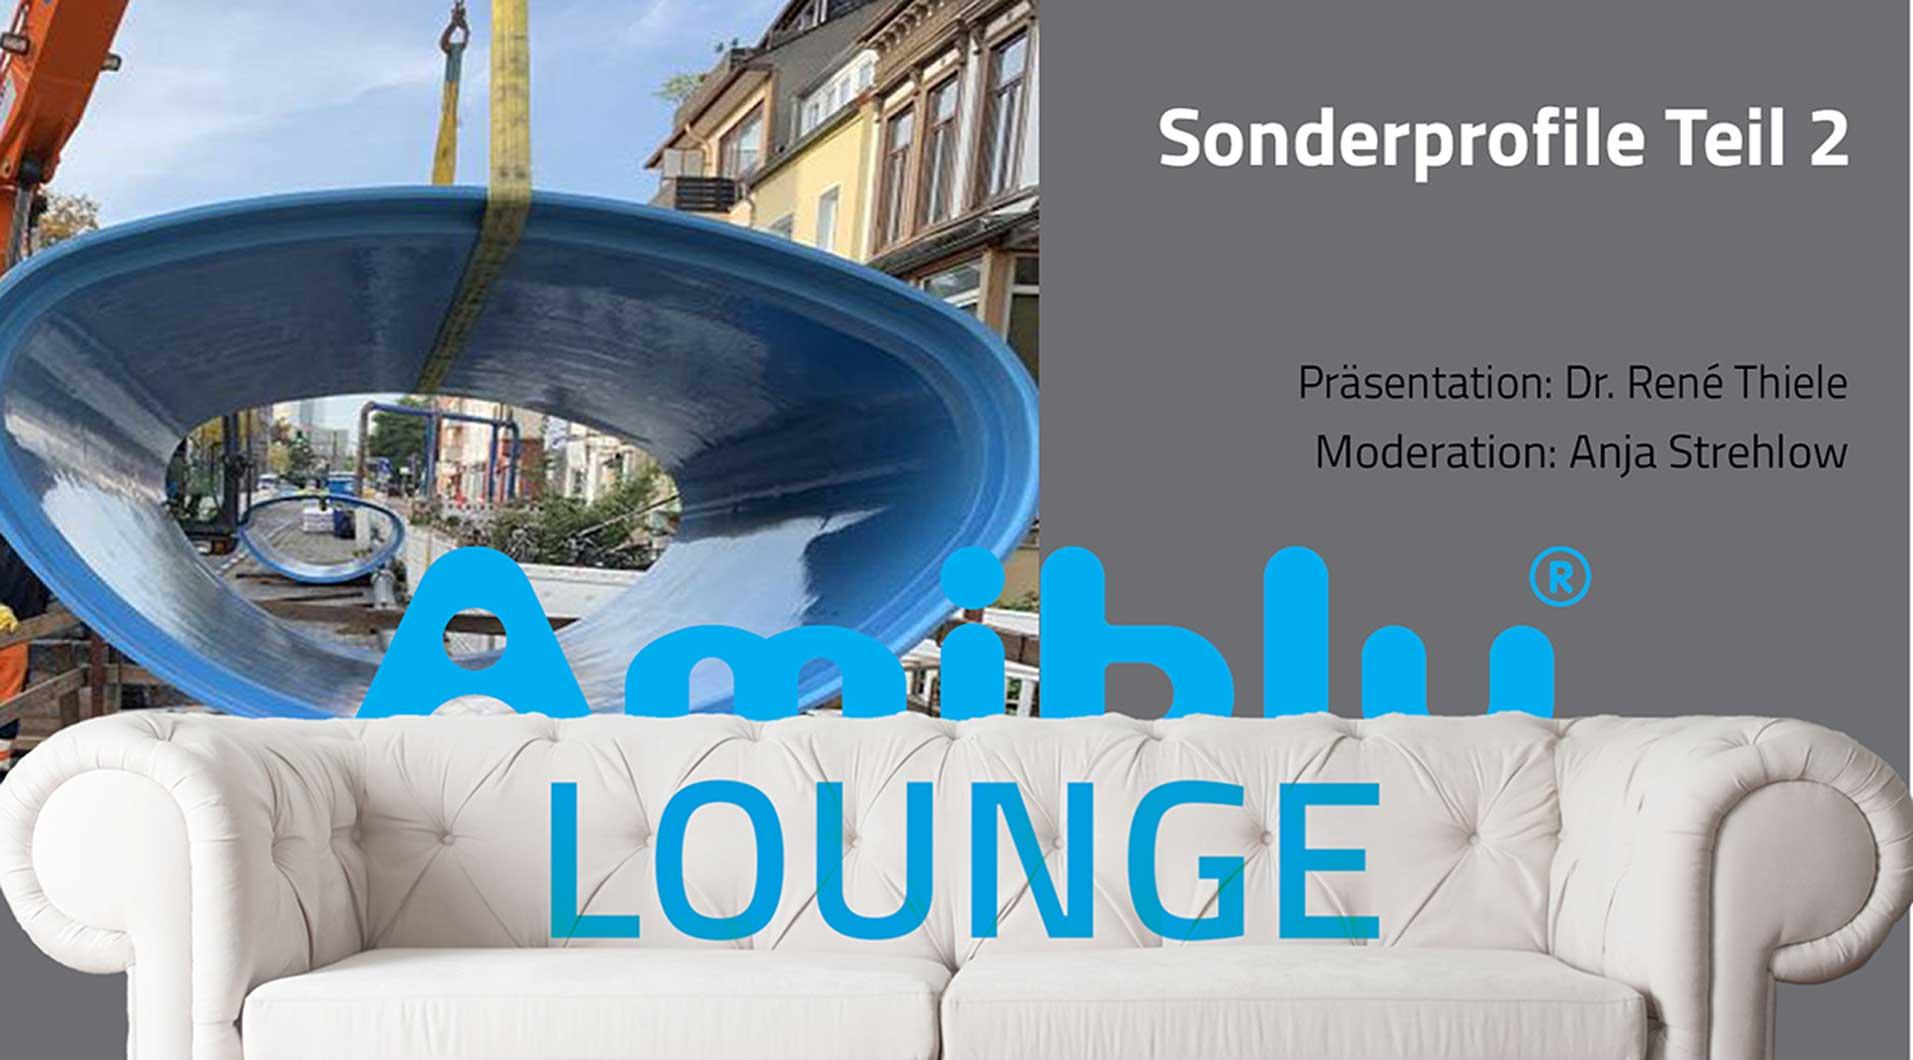 Amiblu Lounge Sonderprofile Teil 2